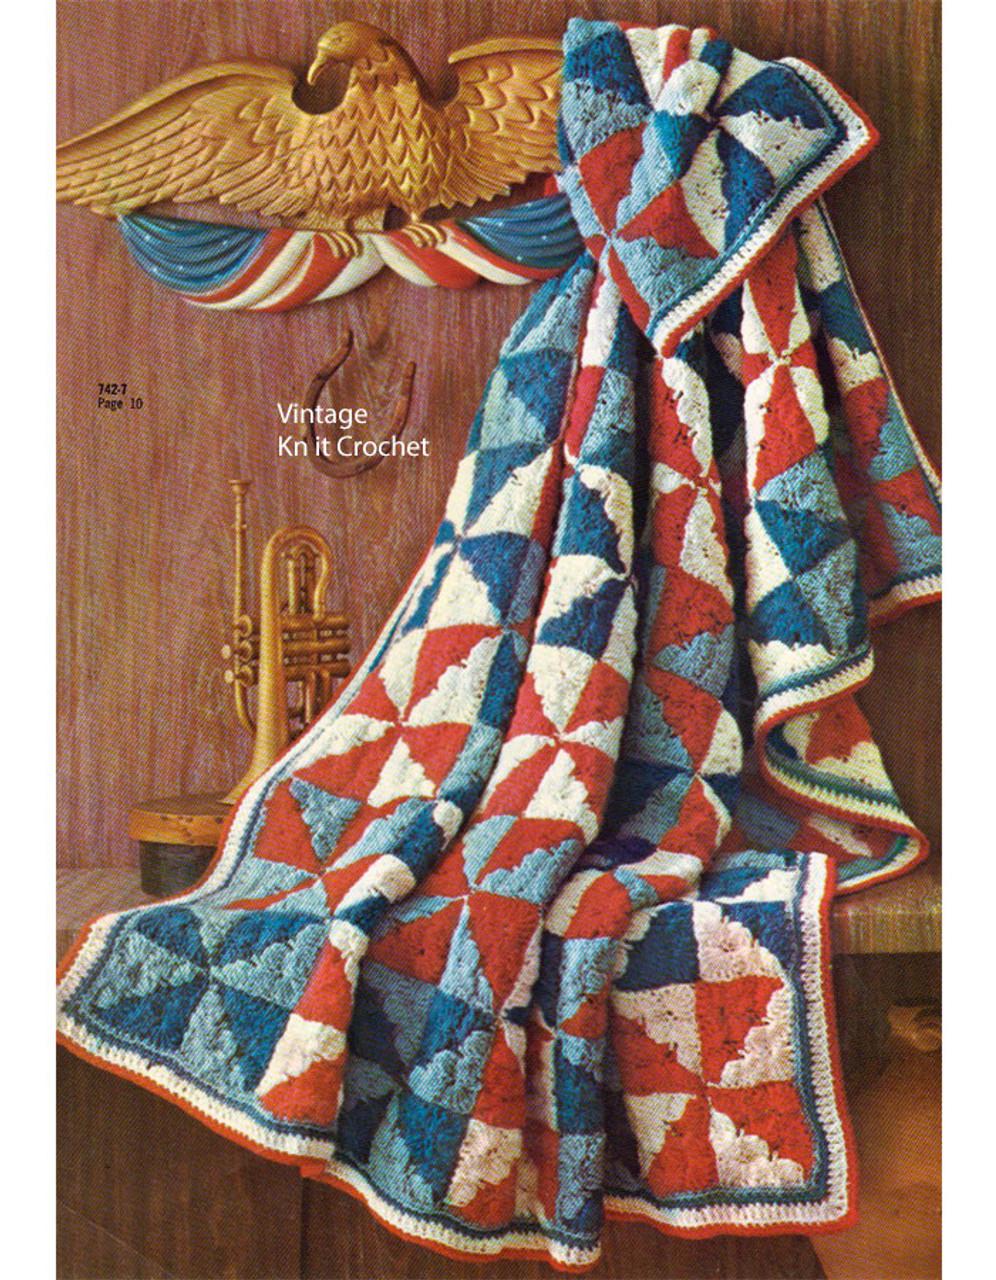 Patchwork Quilt Crochet Afghan Pattern No 742-6